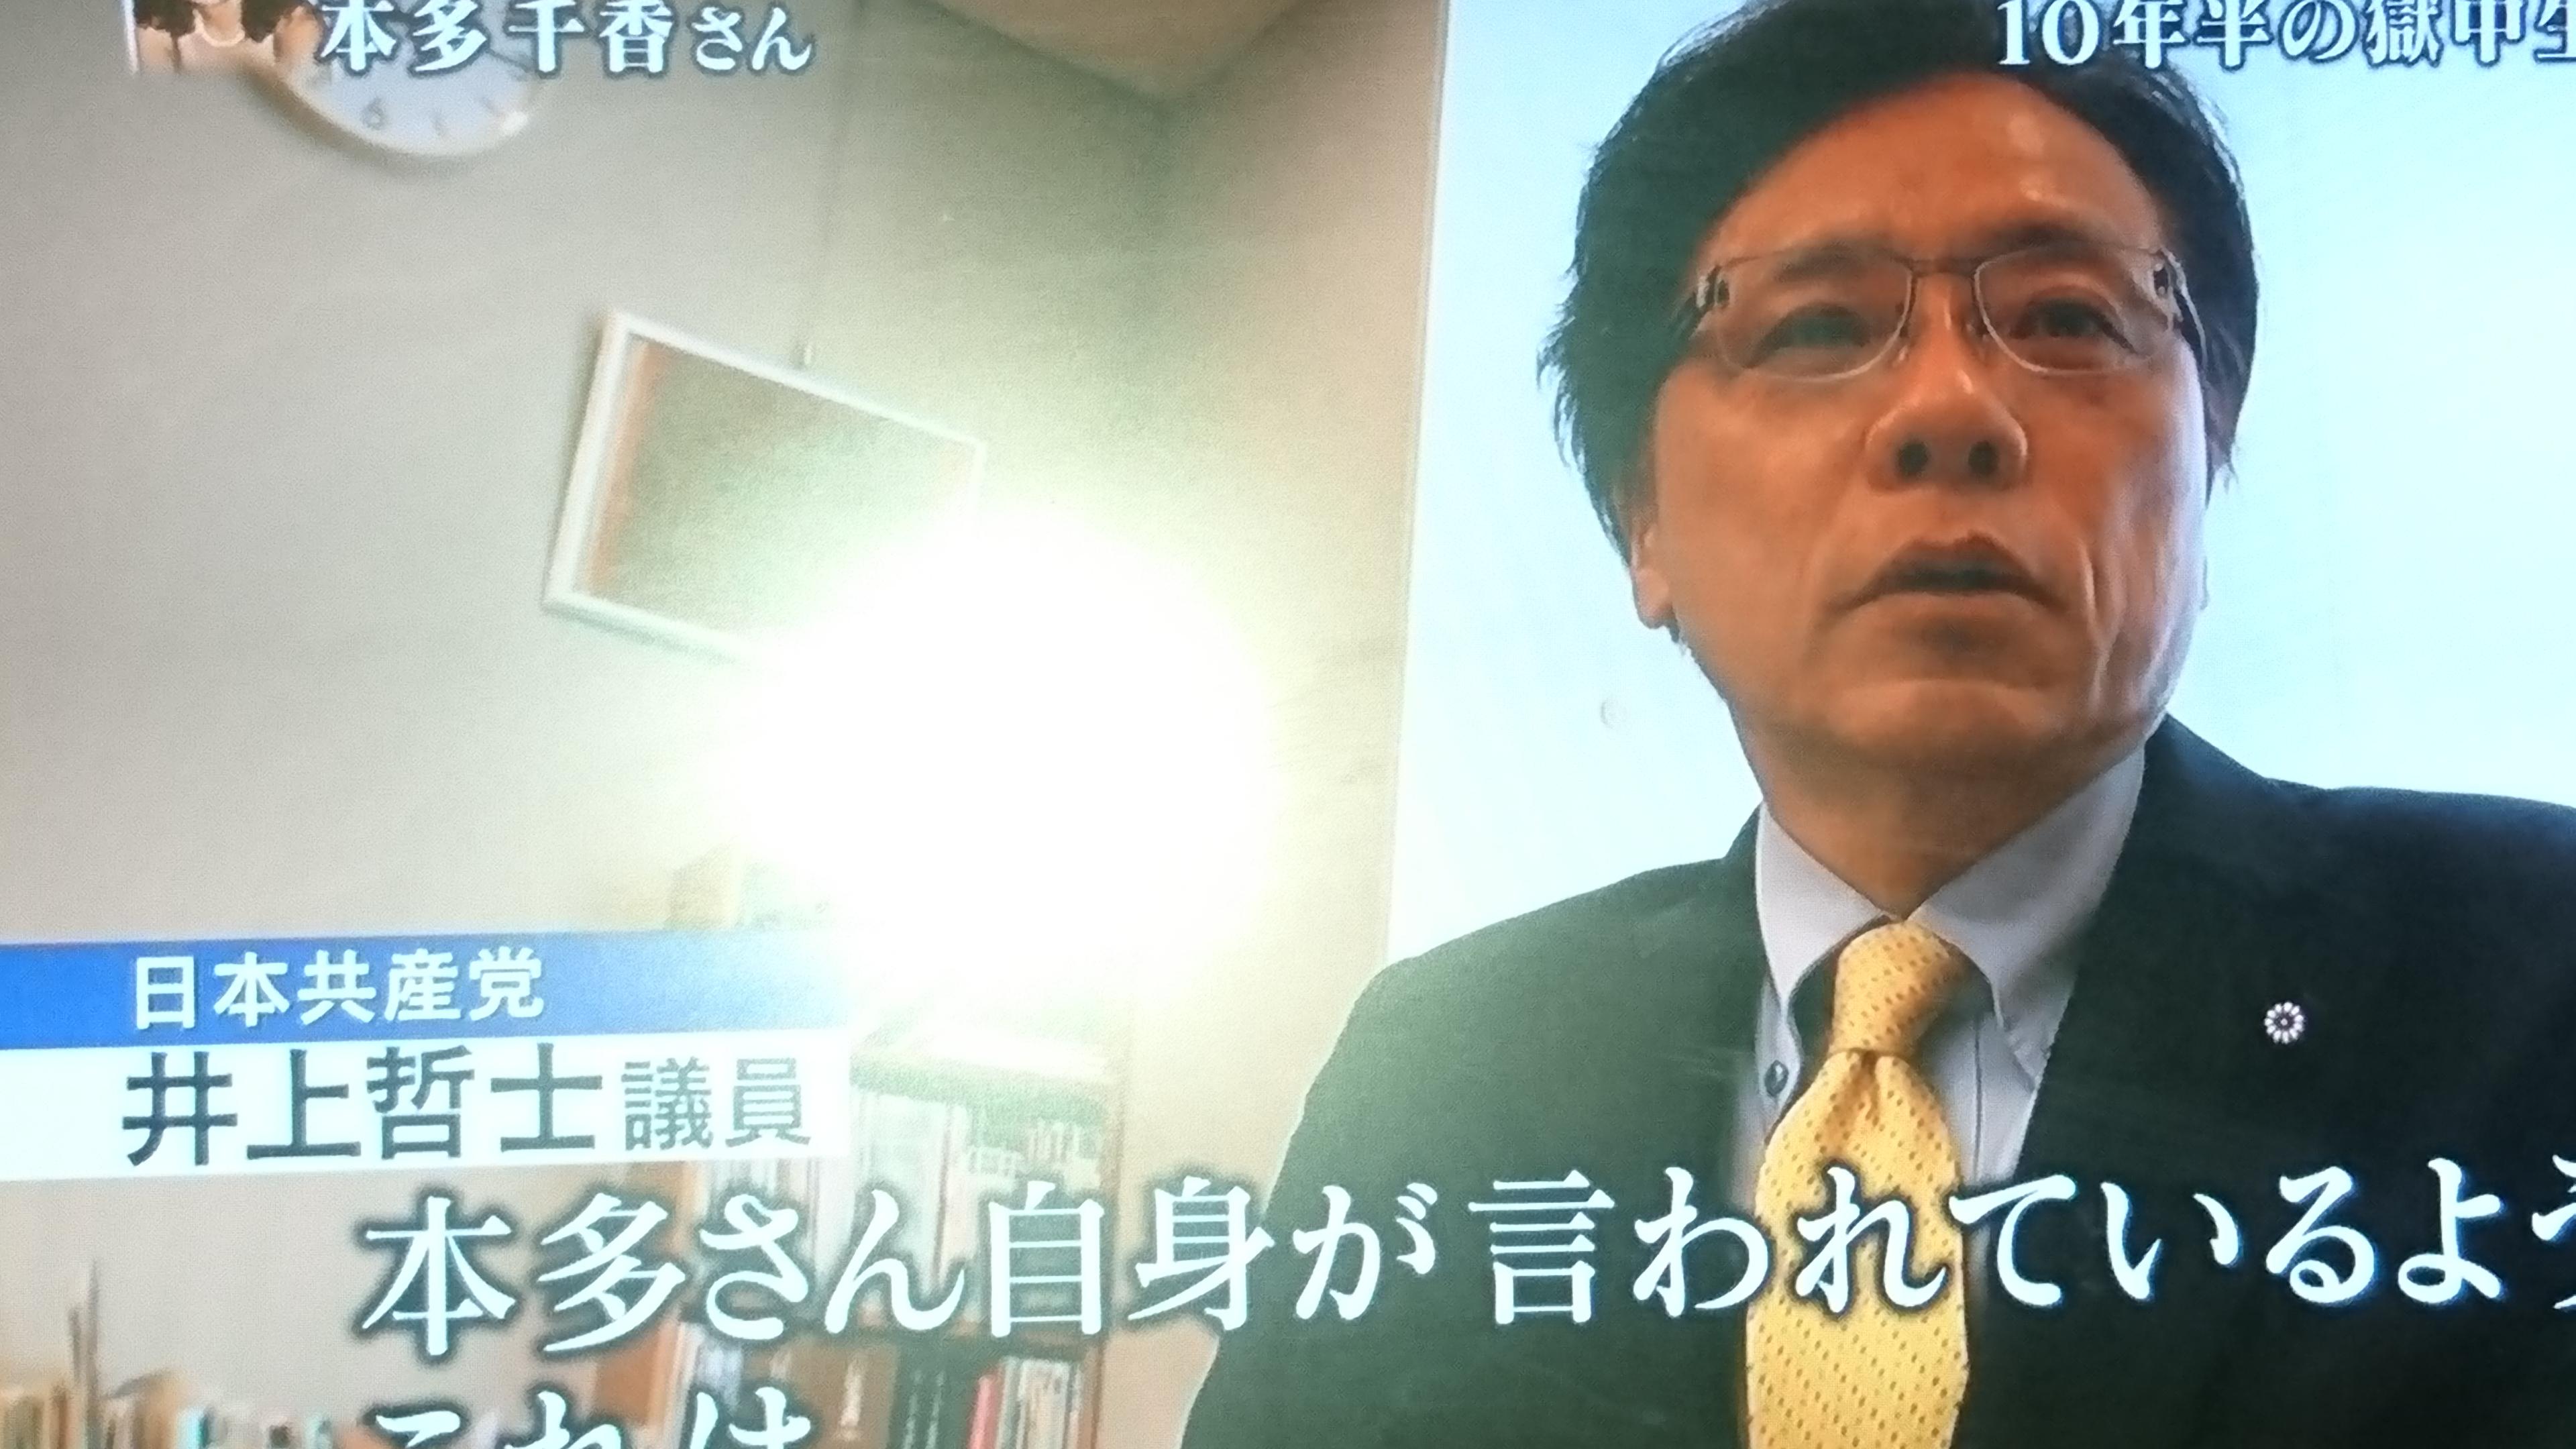 http://www.inoue-satoshi.com/diary/DSC_0317%5B1%5D.JPG